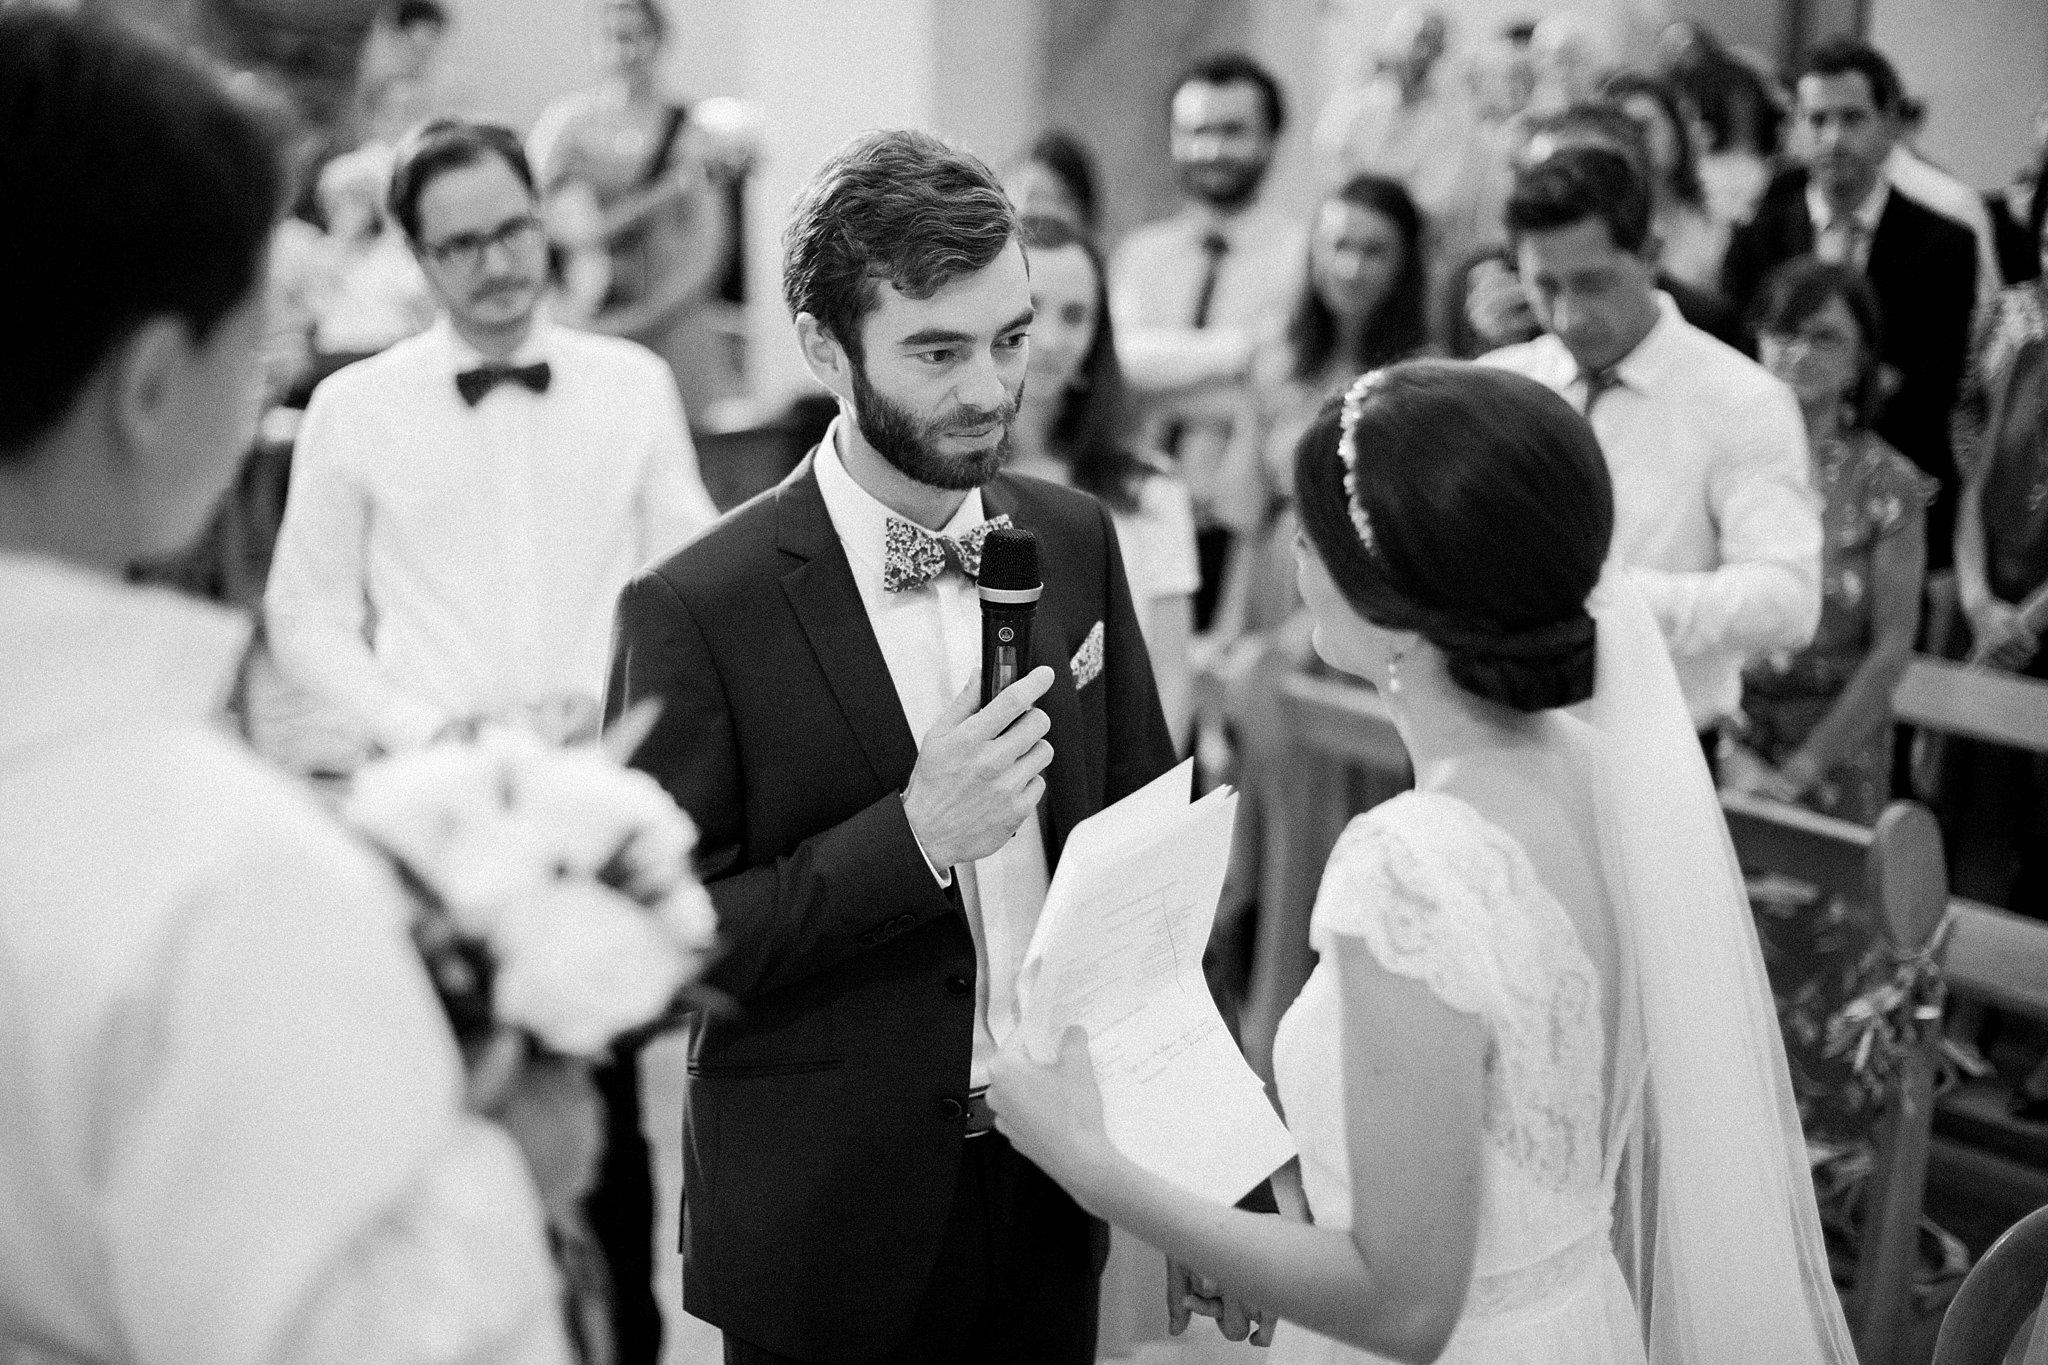 Mariage-a-la-maison-secall-hugo-hennequin-photographe-mariage-perpignan_0085.jpg